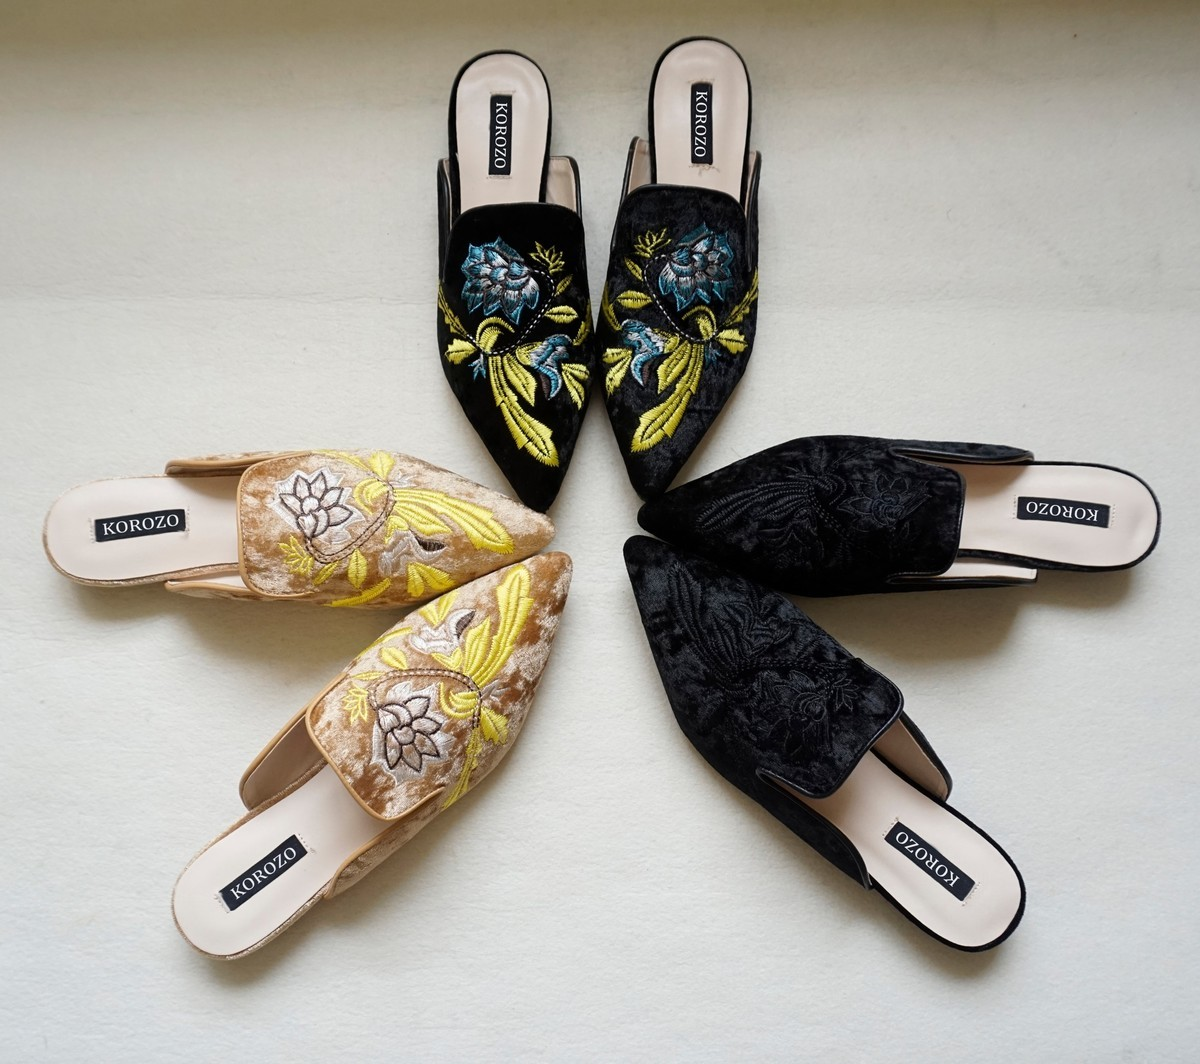 2018 Donne Del Ricamo Velet Muli Slides Chiara Ferragni Vestito Slipper 1.5  cm Heel Flip Flops Slipony Scivolare Su Sandali Scarpe in 2018 Donne Del  Ricamo ... b6430cf16e55